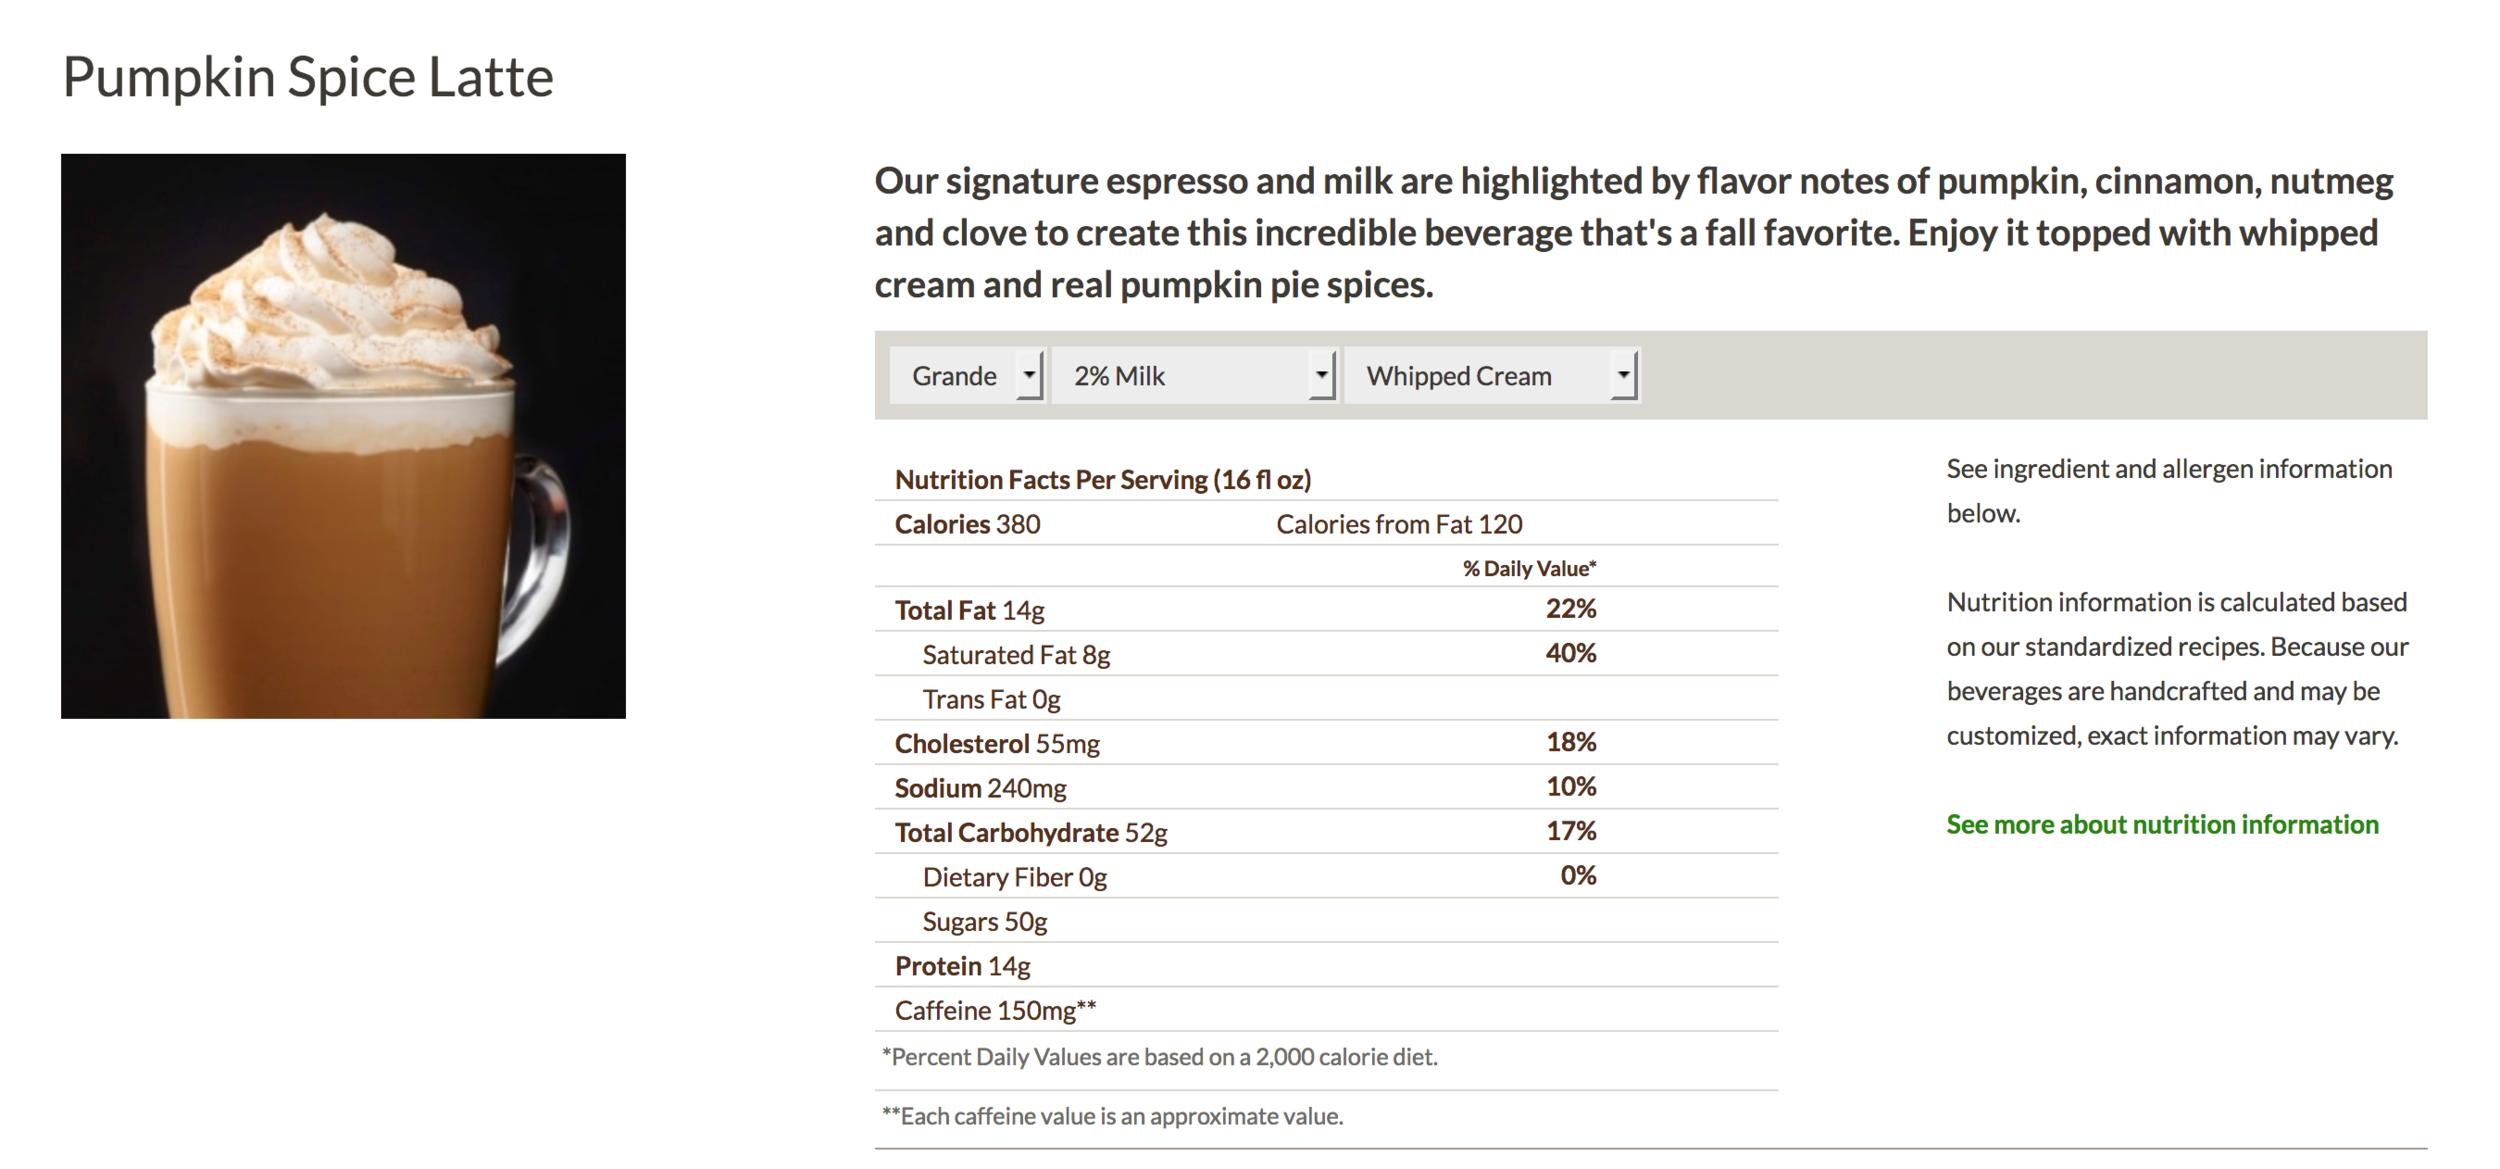 Pumpkin Spice Latte information, taken from Starbucks' website.